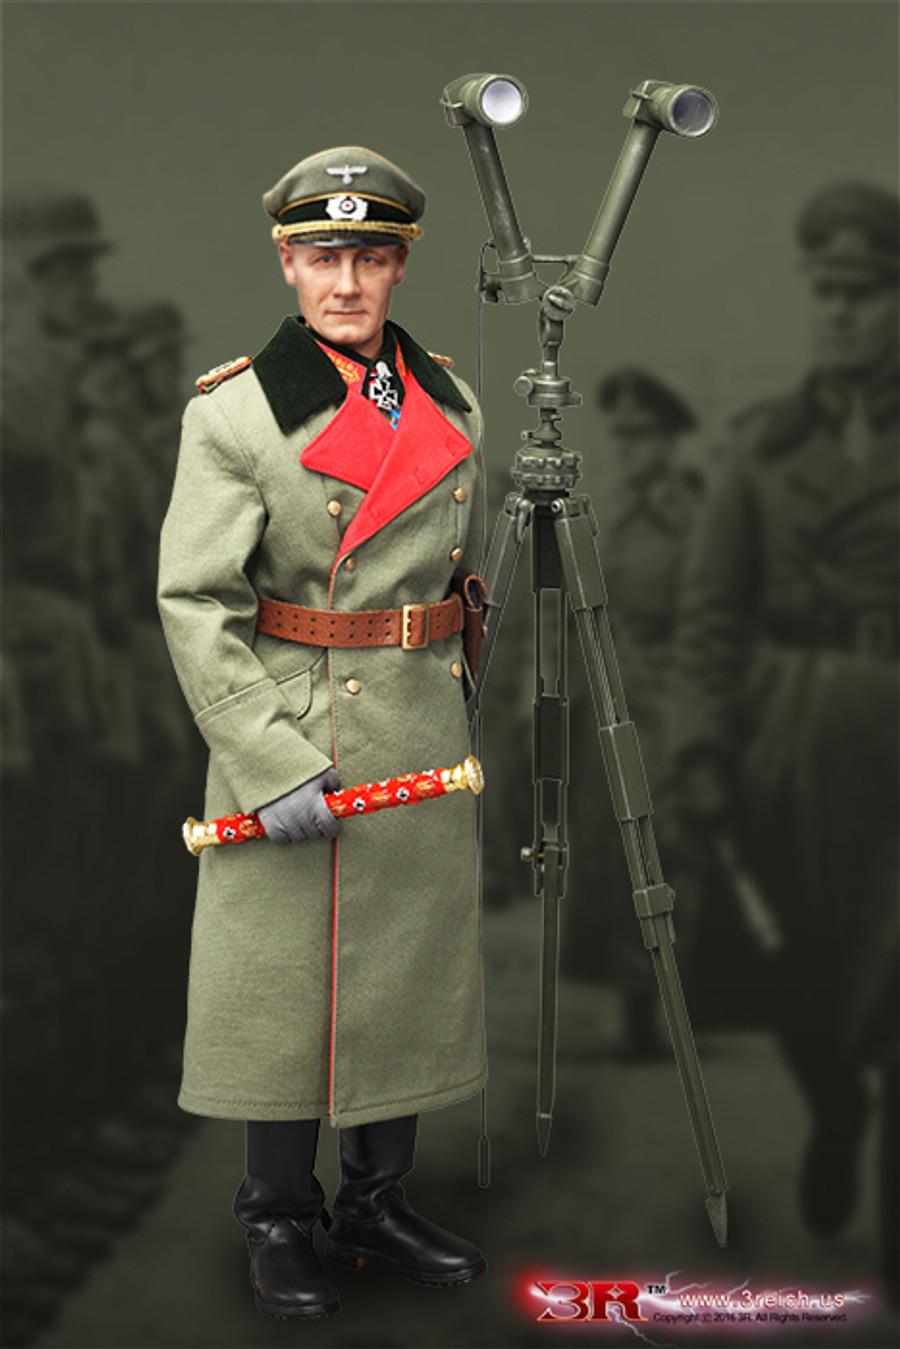 3R - Erwin Rommel - Generalfeldmarschall Atlantic Wall 1944